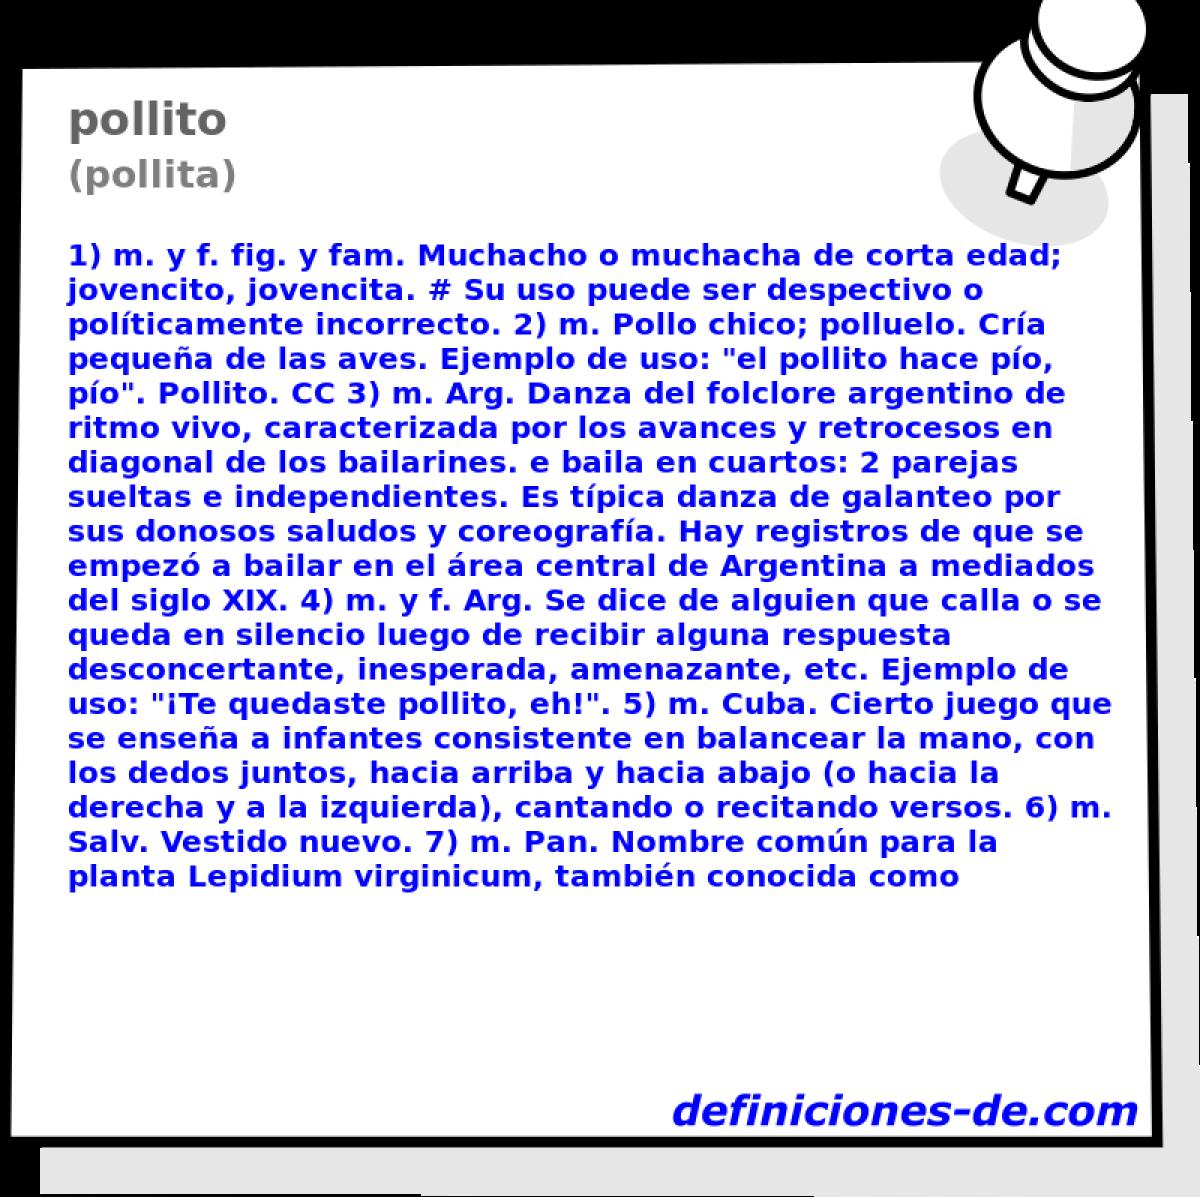 Qué significa Pollito (pollita)?